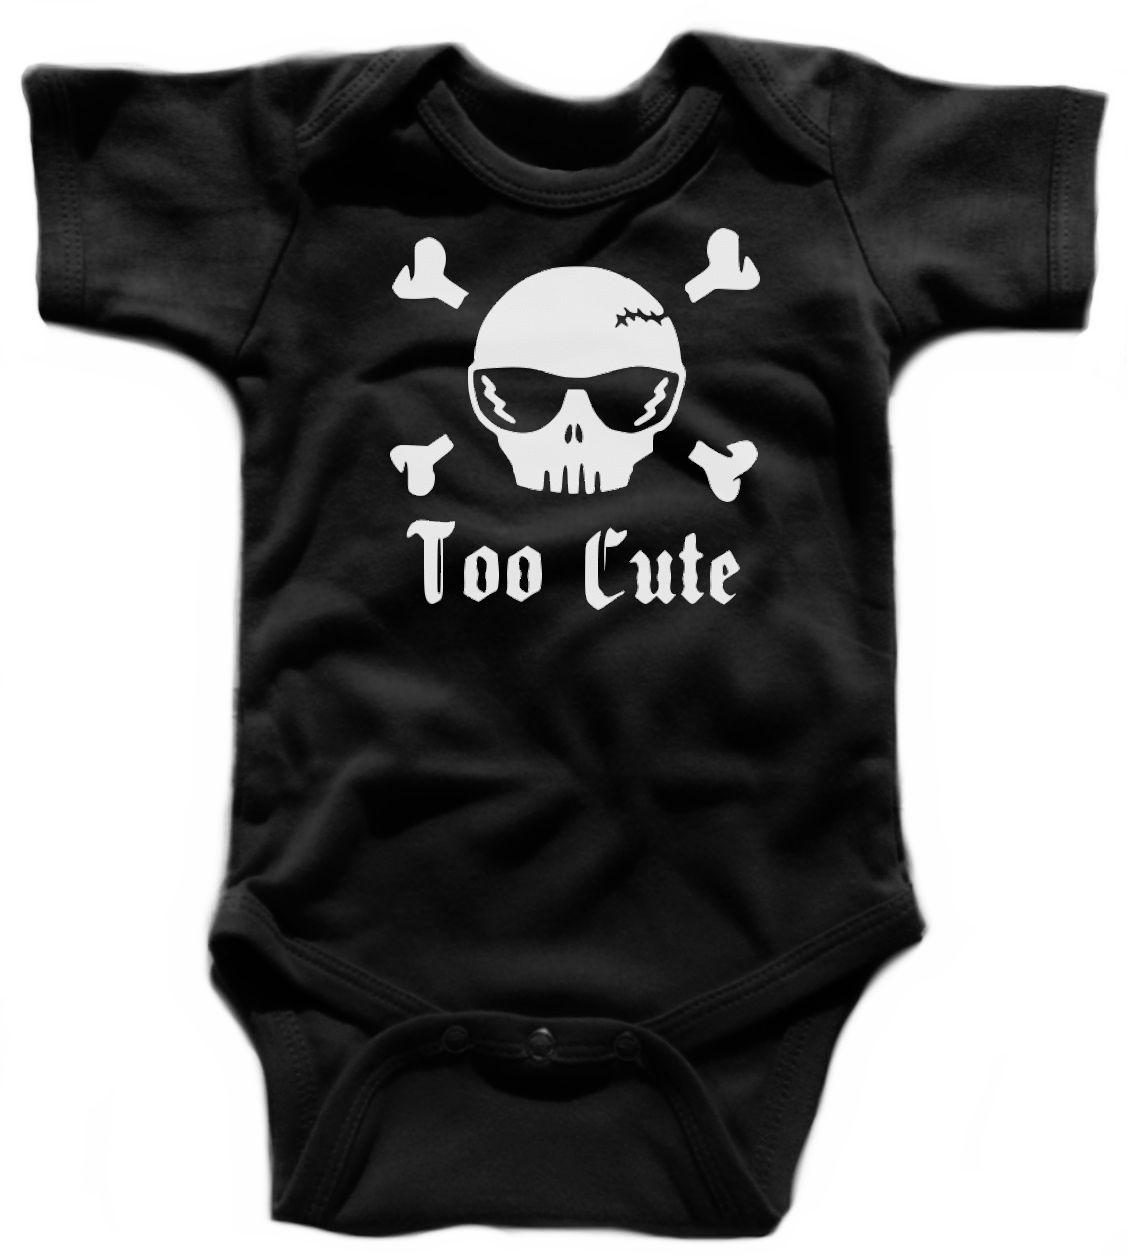 BABY PUNK Rompasuit black Strampler